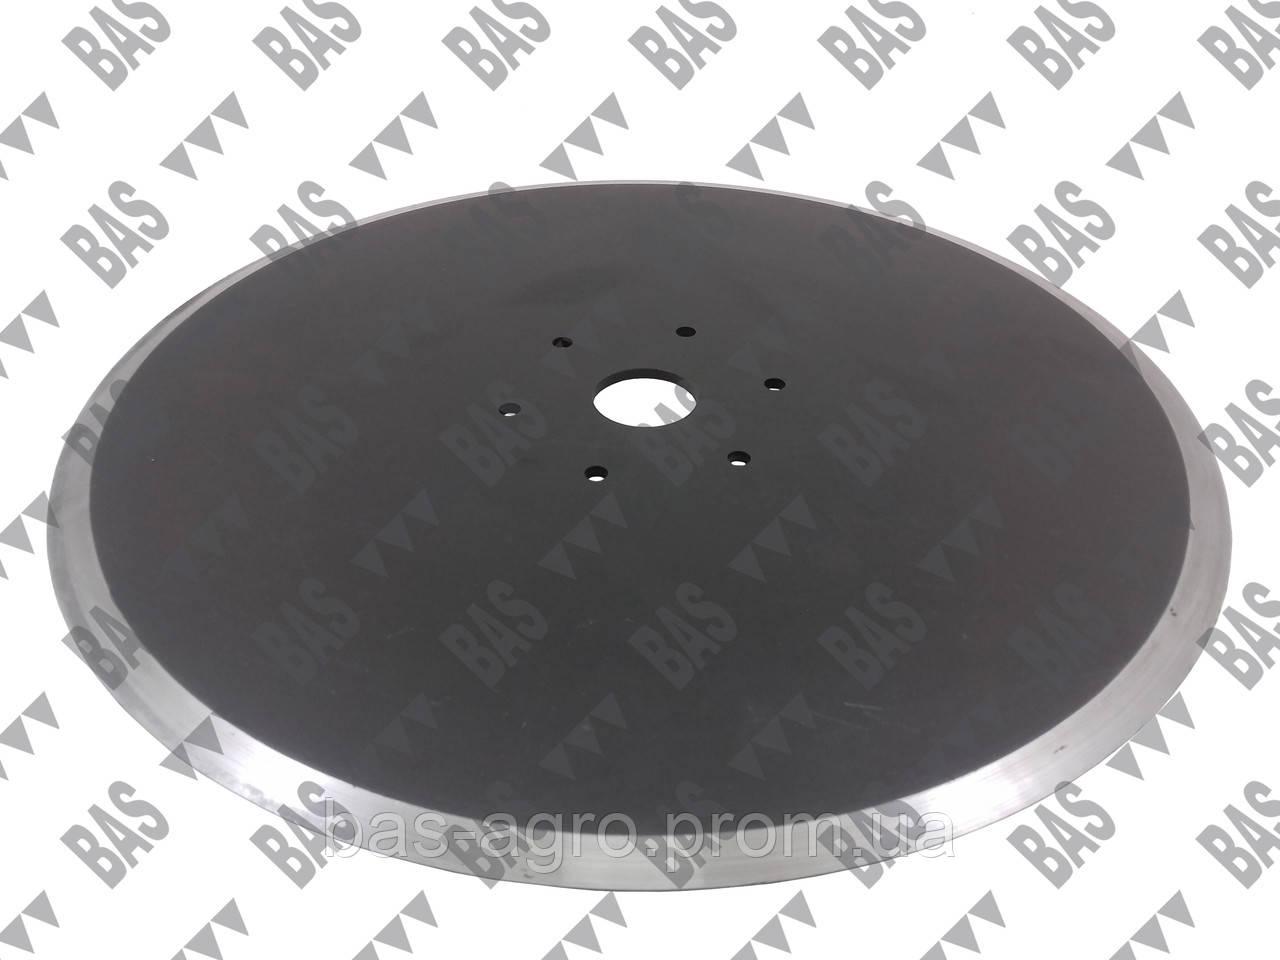 Диск сошника 7009 350mm Monosem аналог